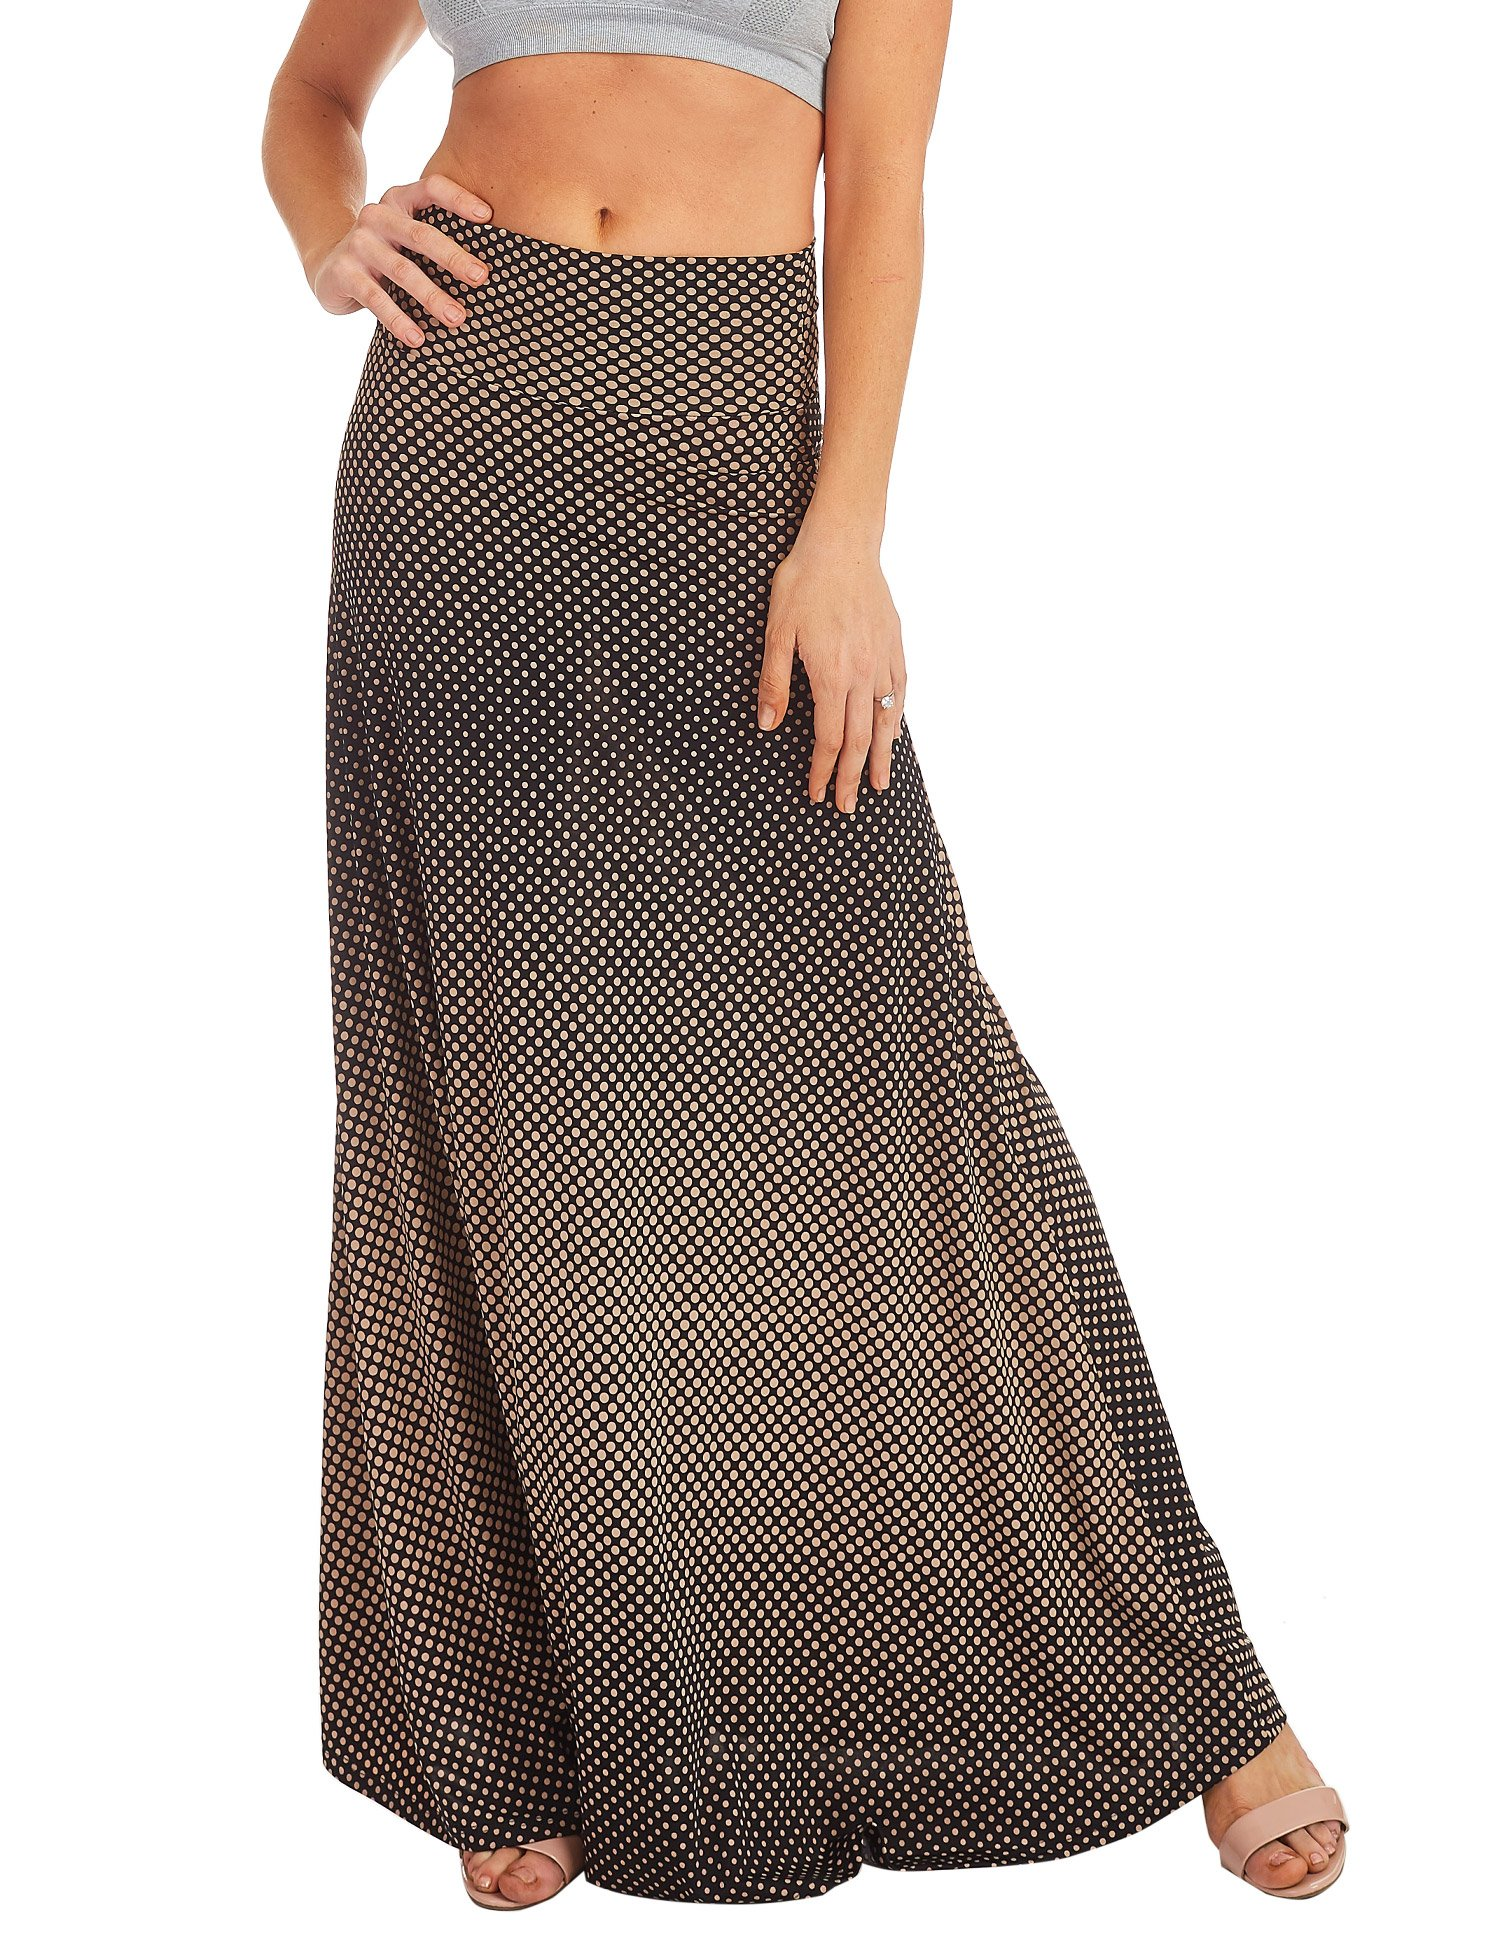 Lock and Love WB1191 Womens Chevron Print Maxi Skirt XXXL Brown_Polka